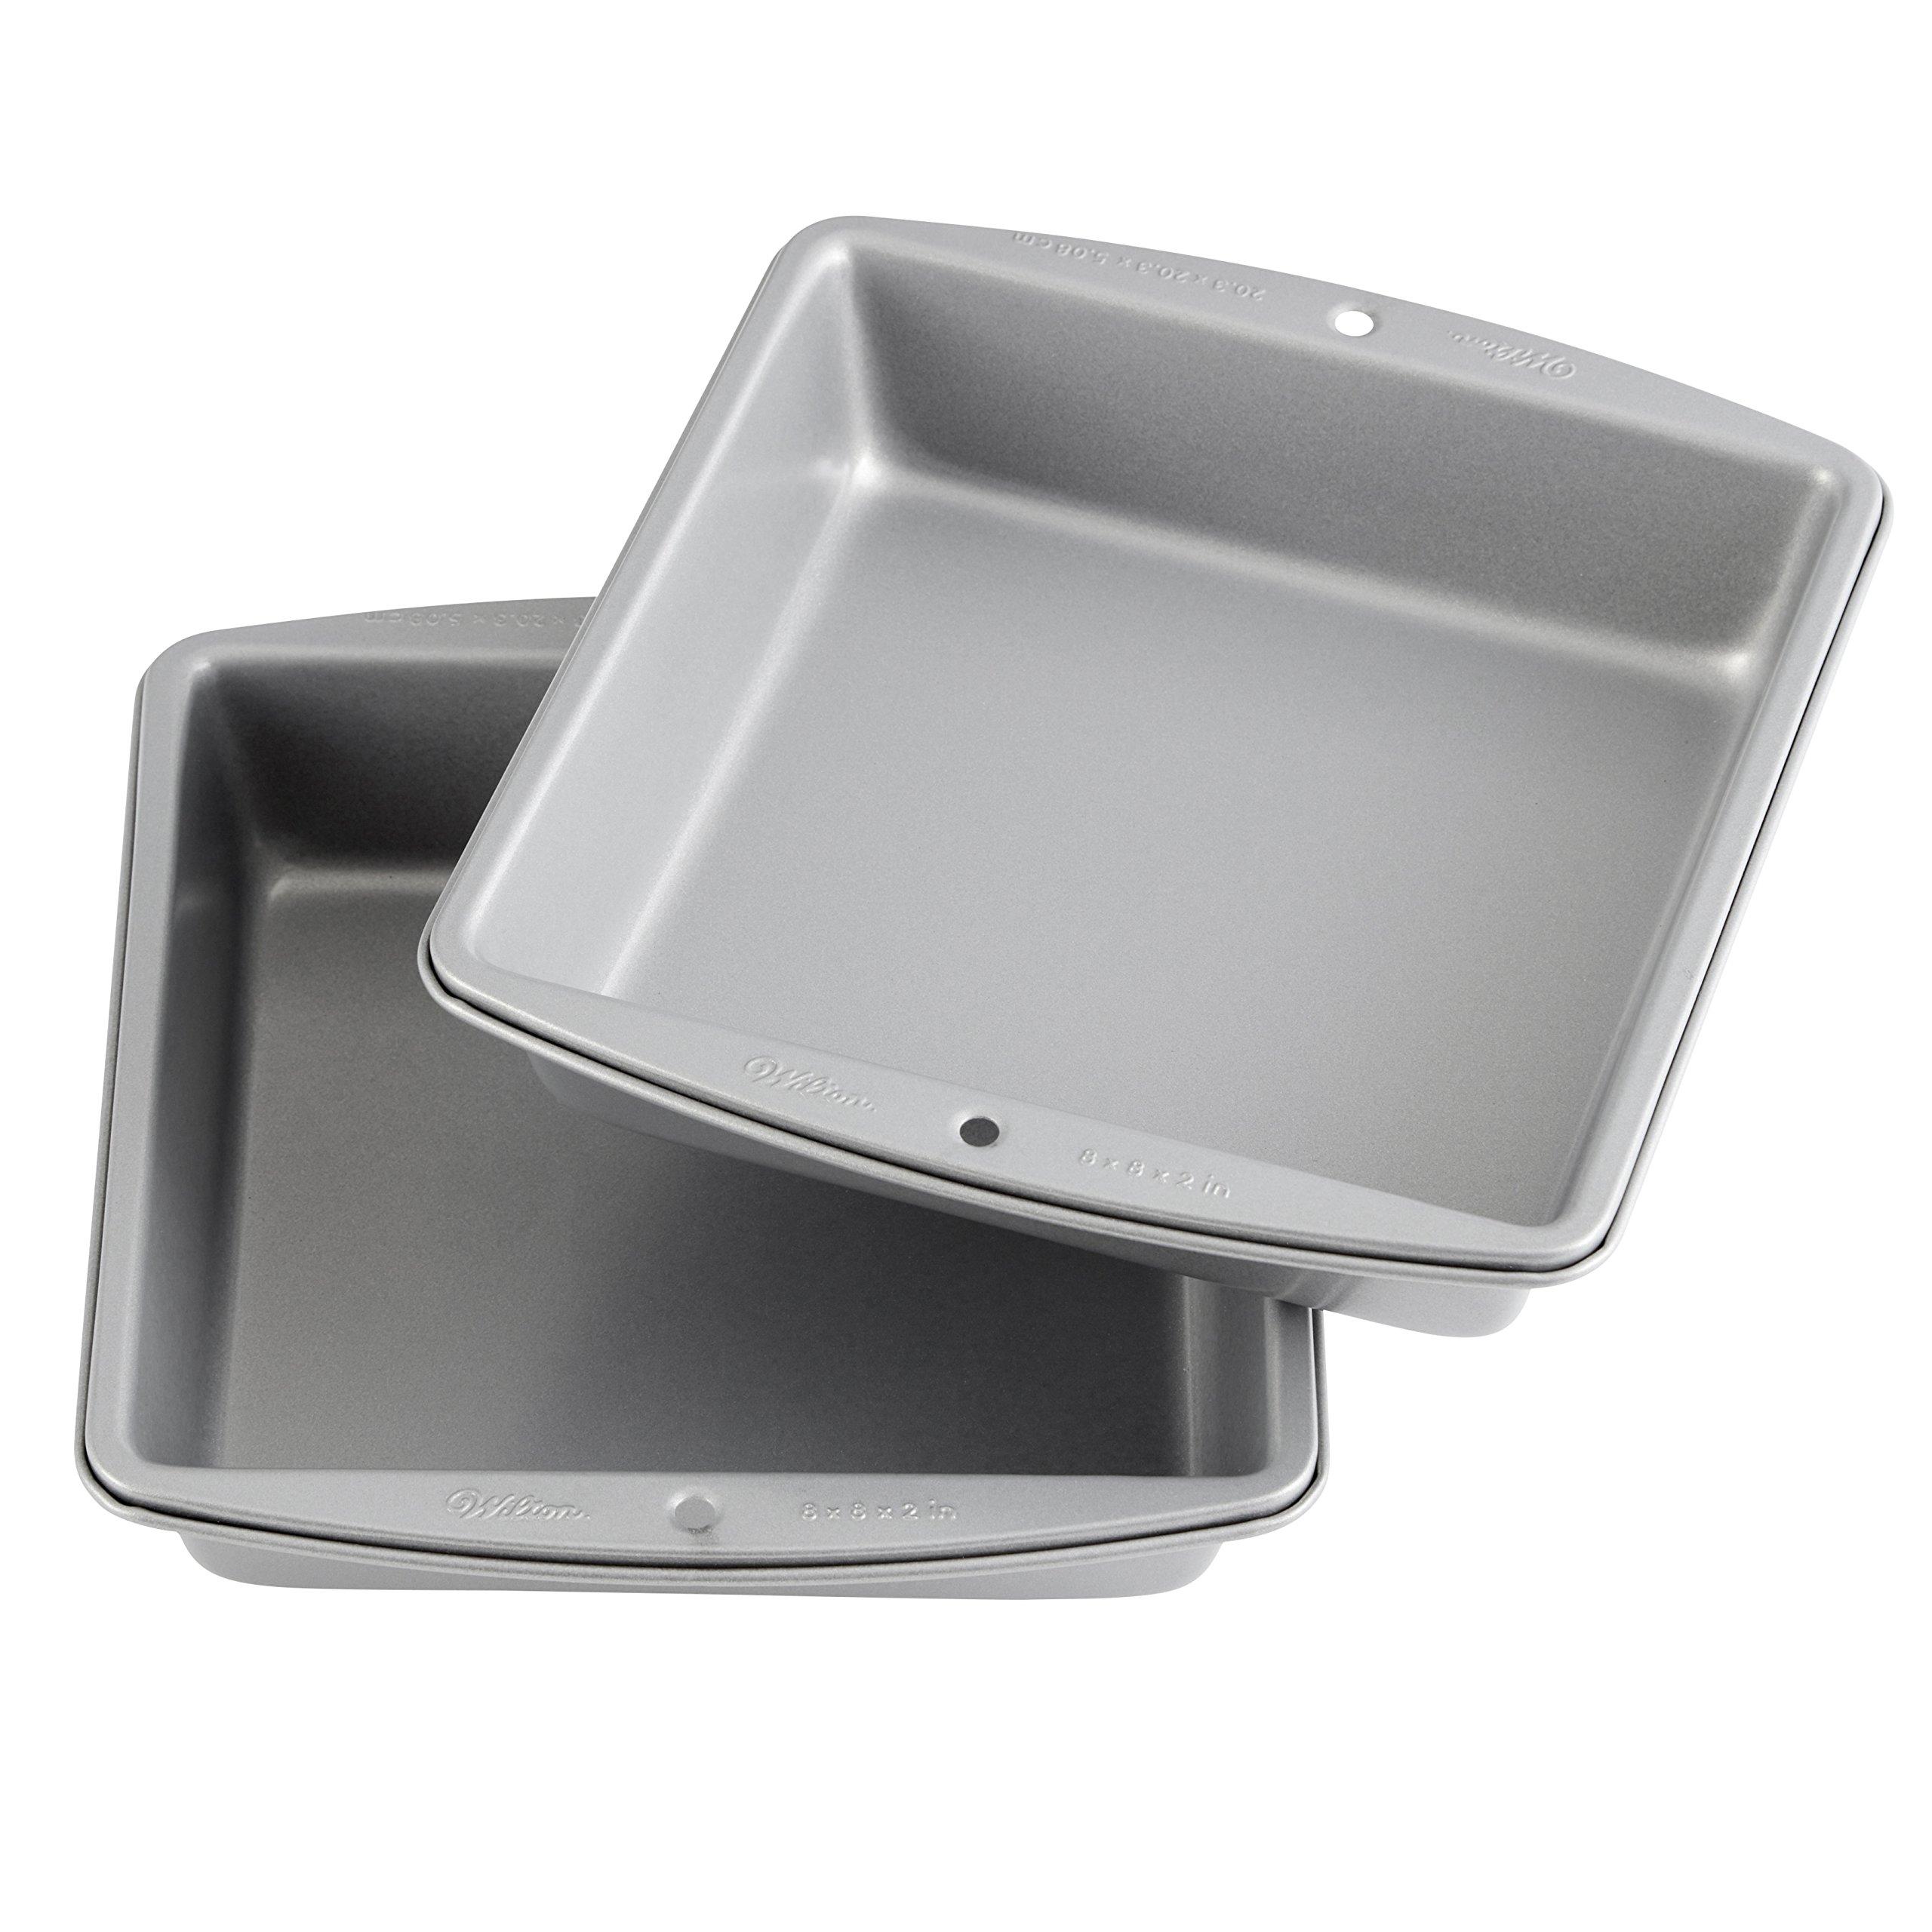 Wilton Recipe Right - 8-Inch Non-Stick Square Cake Pans, Multipack of 2 by Wilton